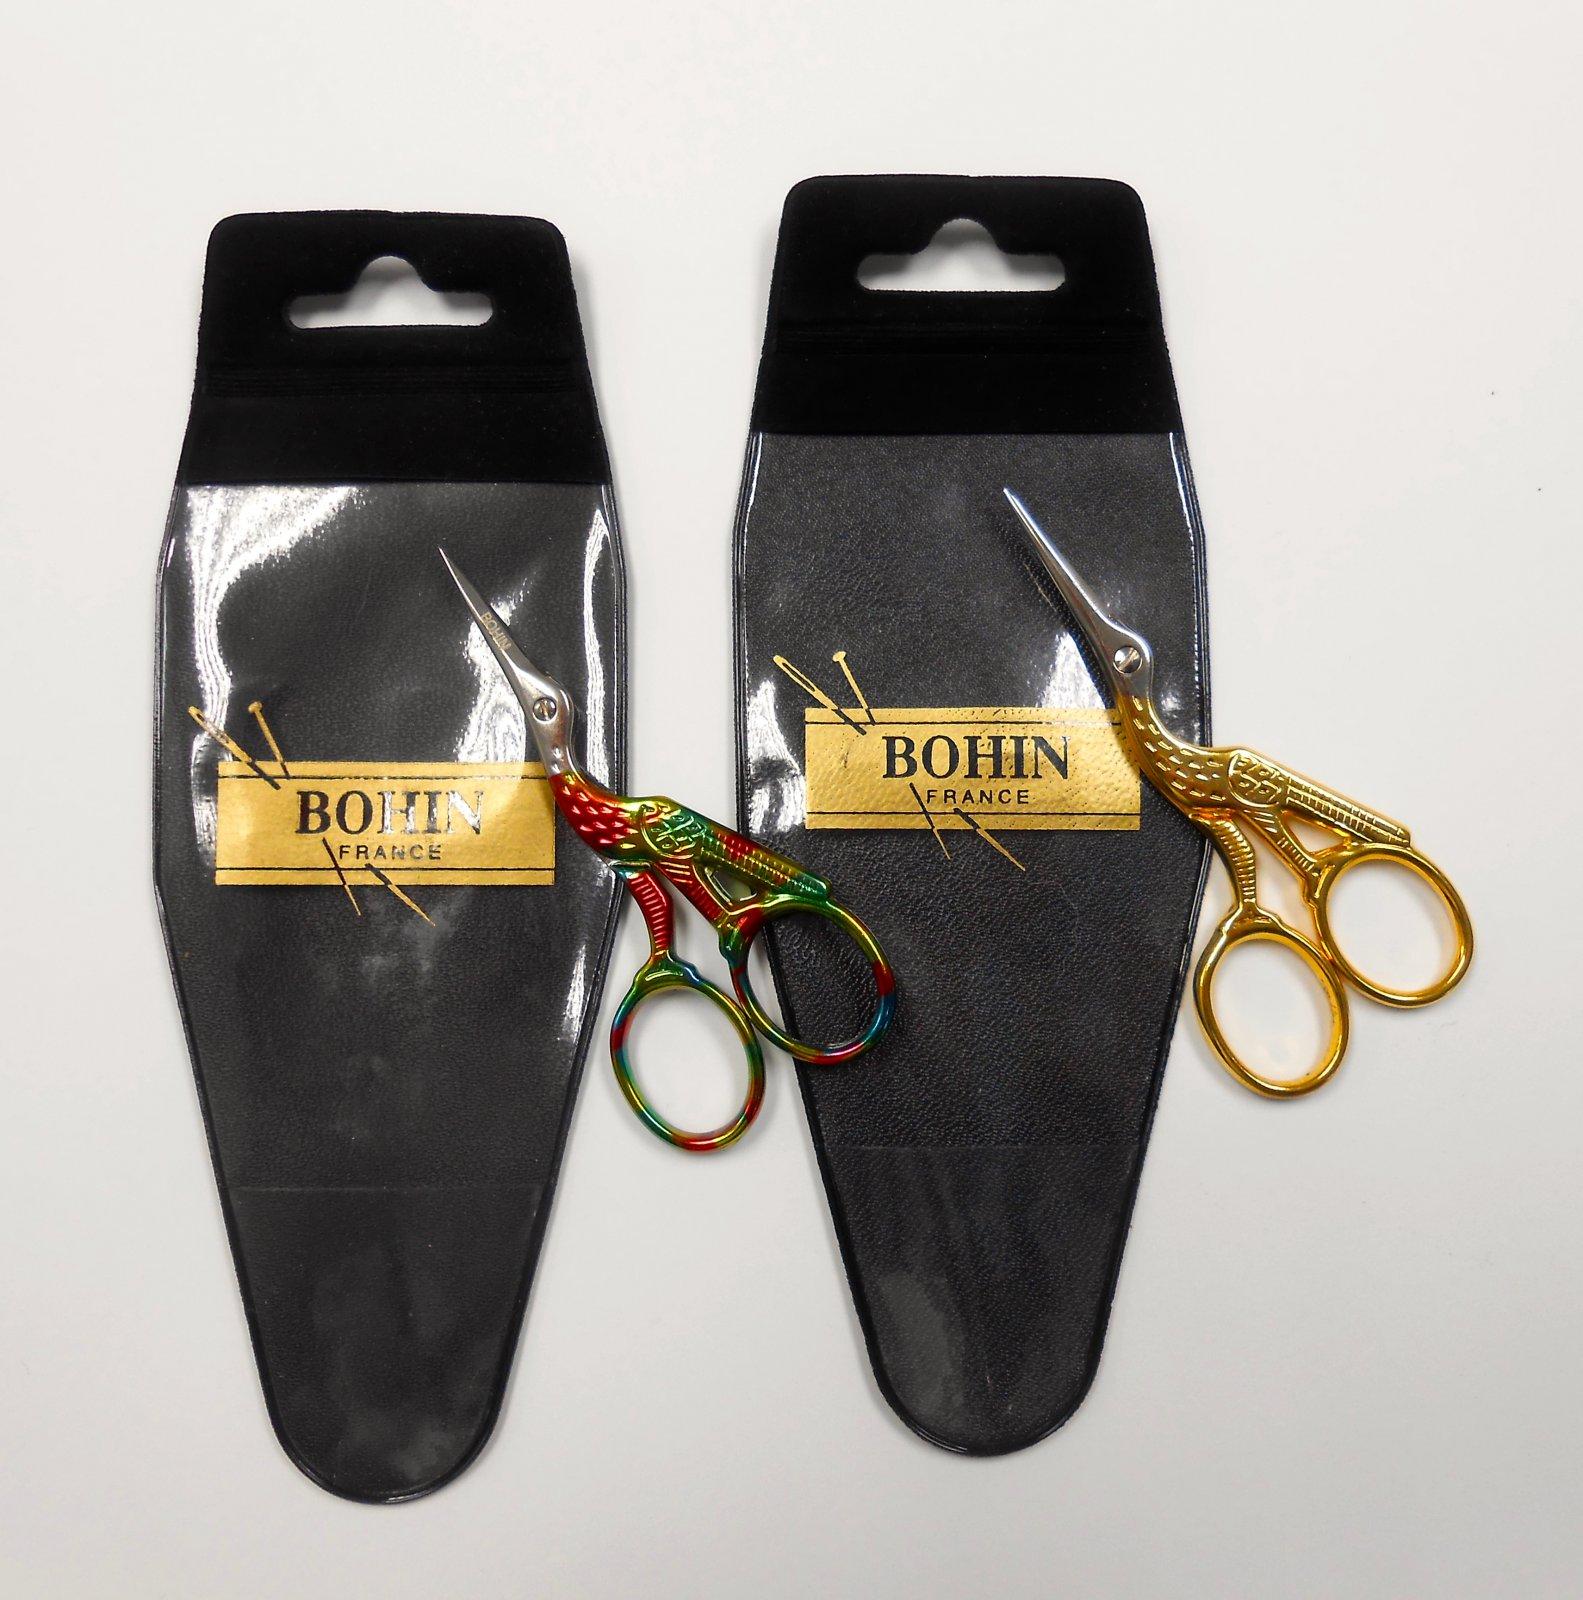 Bohin Stork Scissors - colorful